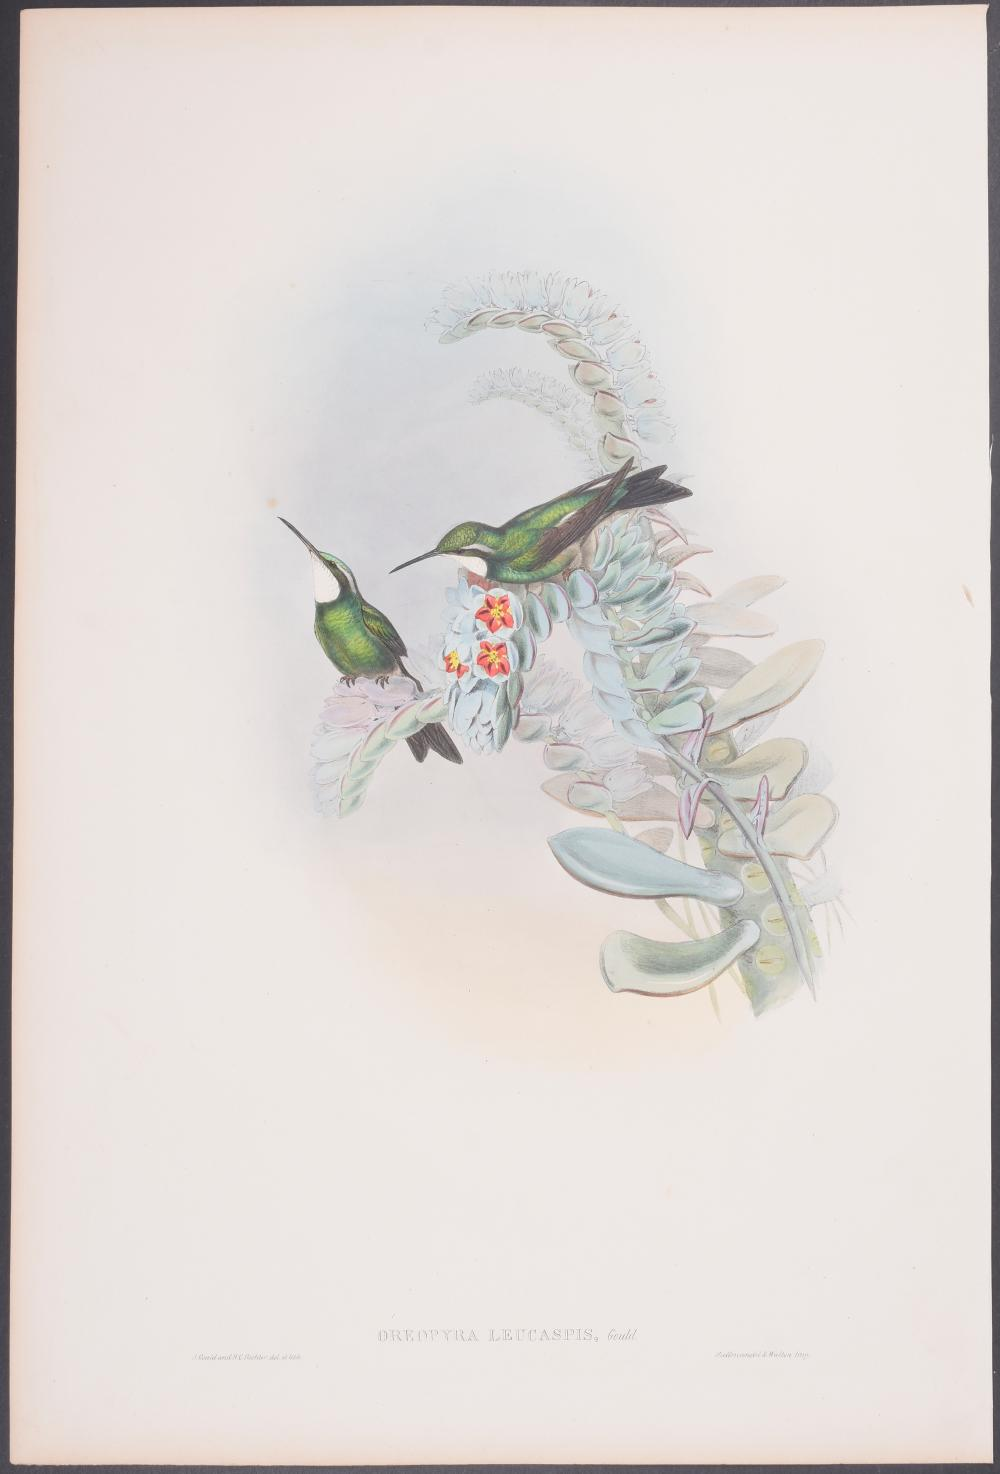 Lot 11170: Gould - White-throated Hummingbird; Oreoyra leucaspis